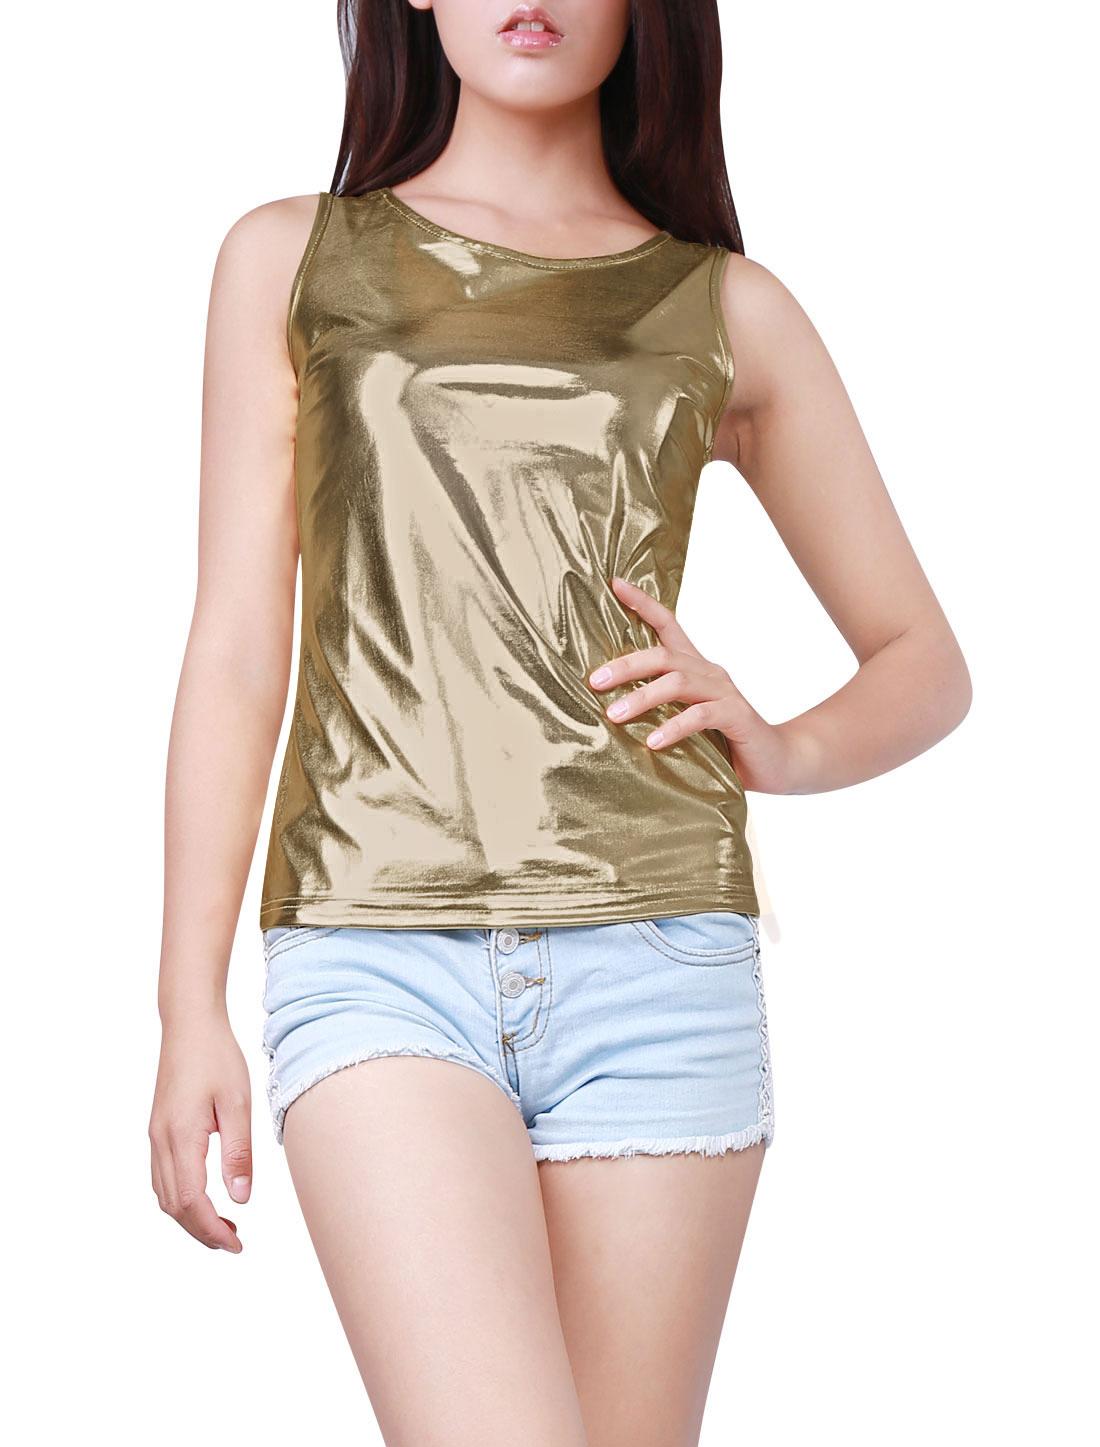 Allegra K Woman U Neck Stretch Slim Fit Metallic Tank Top Light Gold S